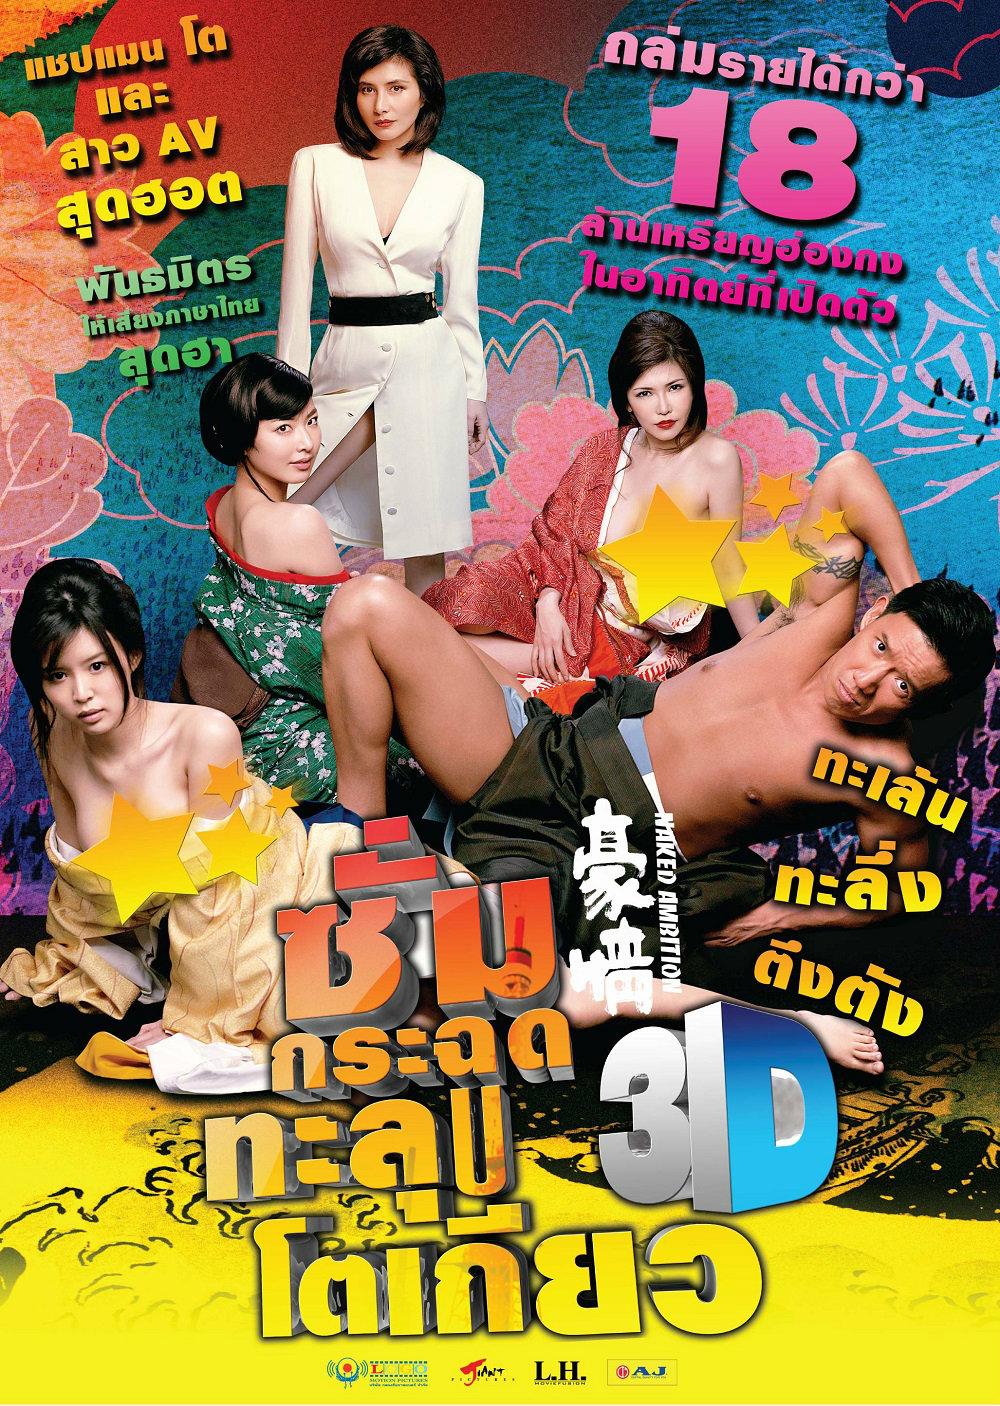 Naked Ambition 2 3D ซั่มกระฉูด ทะลุโตเกียว